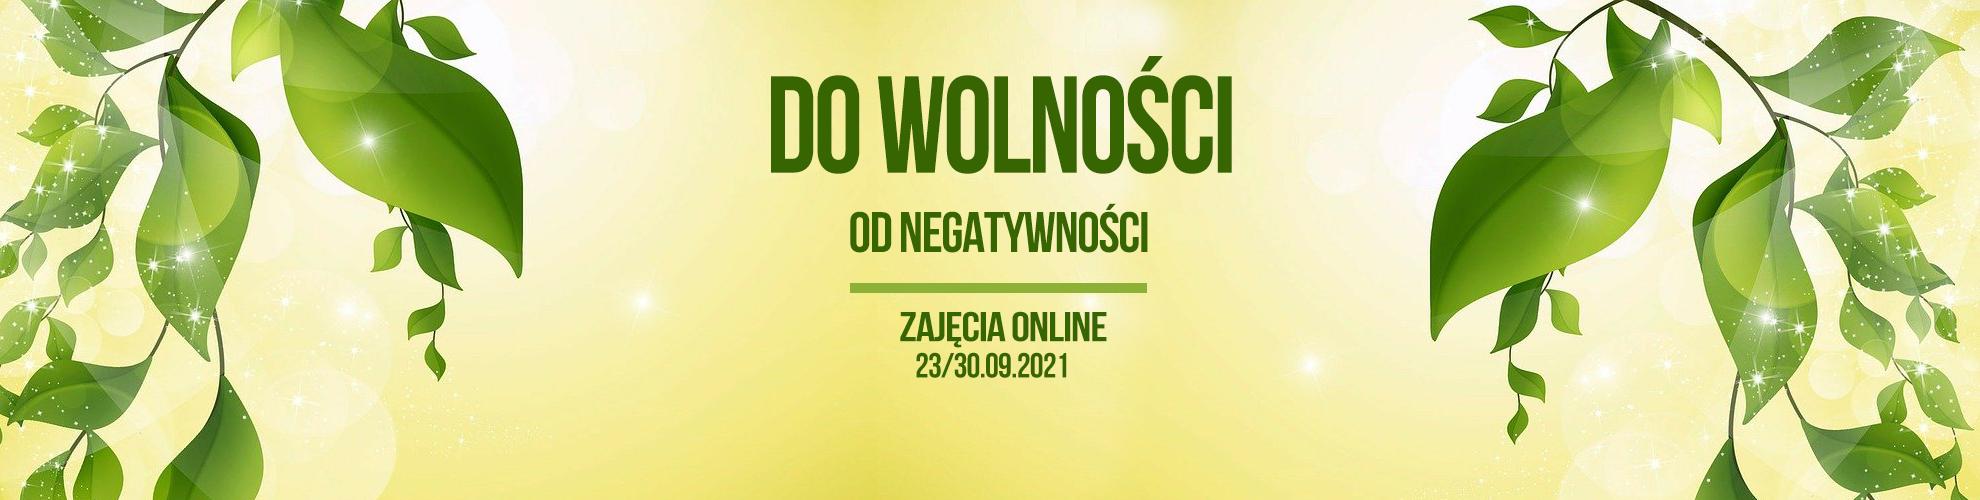 DO-WOLNOSCI